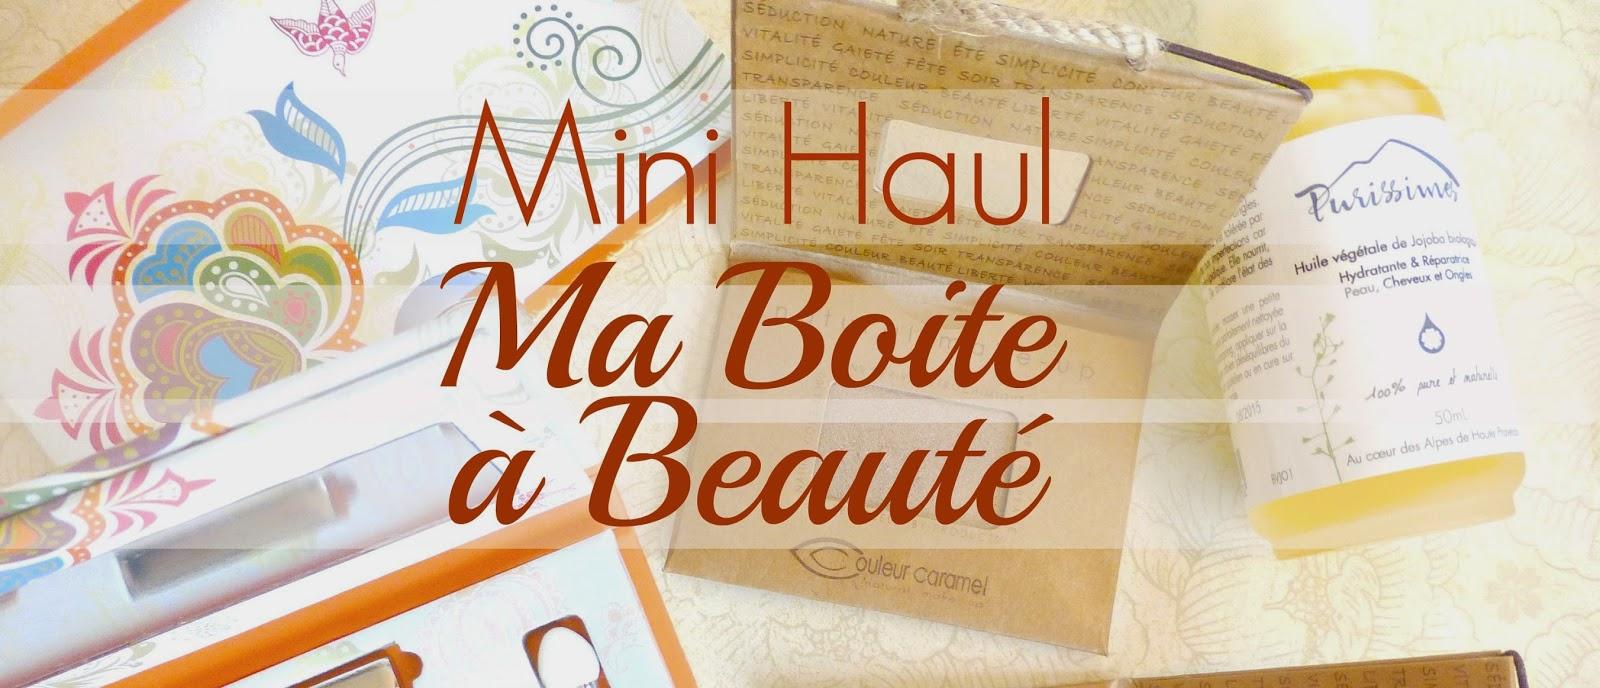 Mini Haul soldesque Ma Boite à beauté